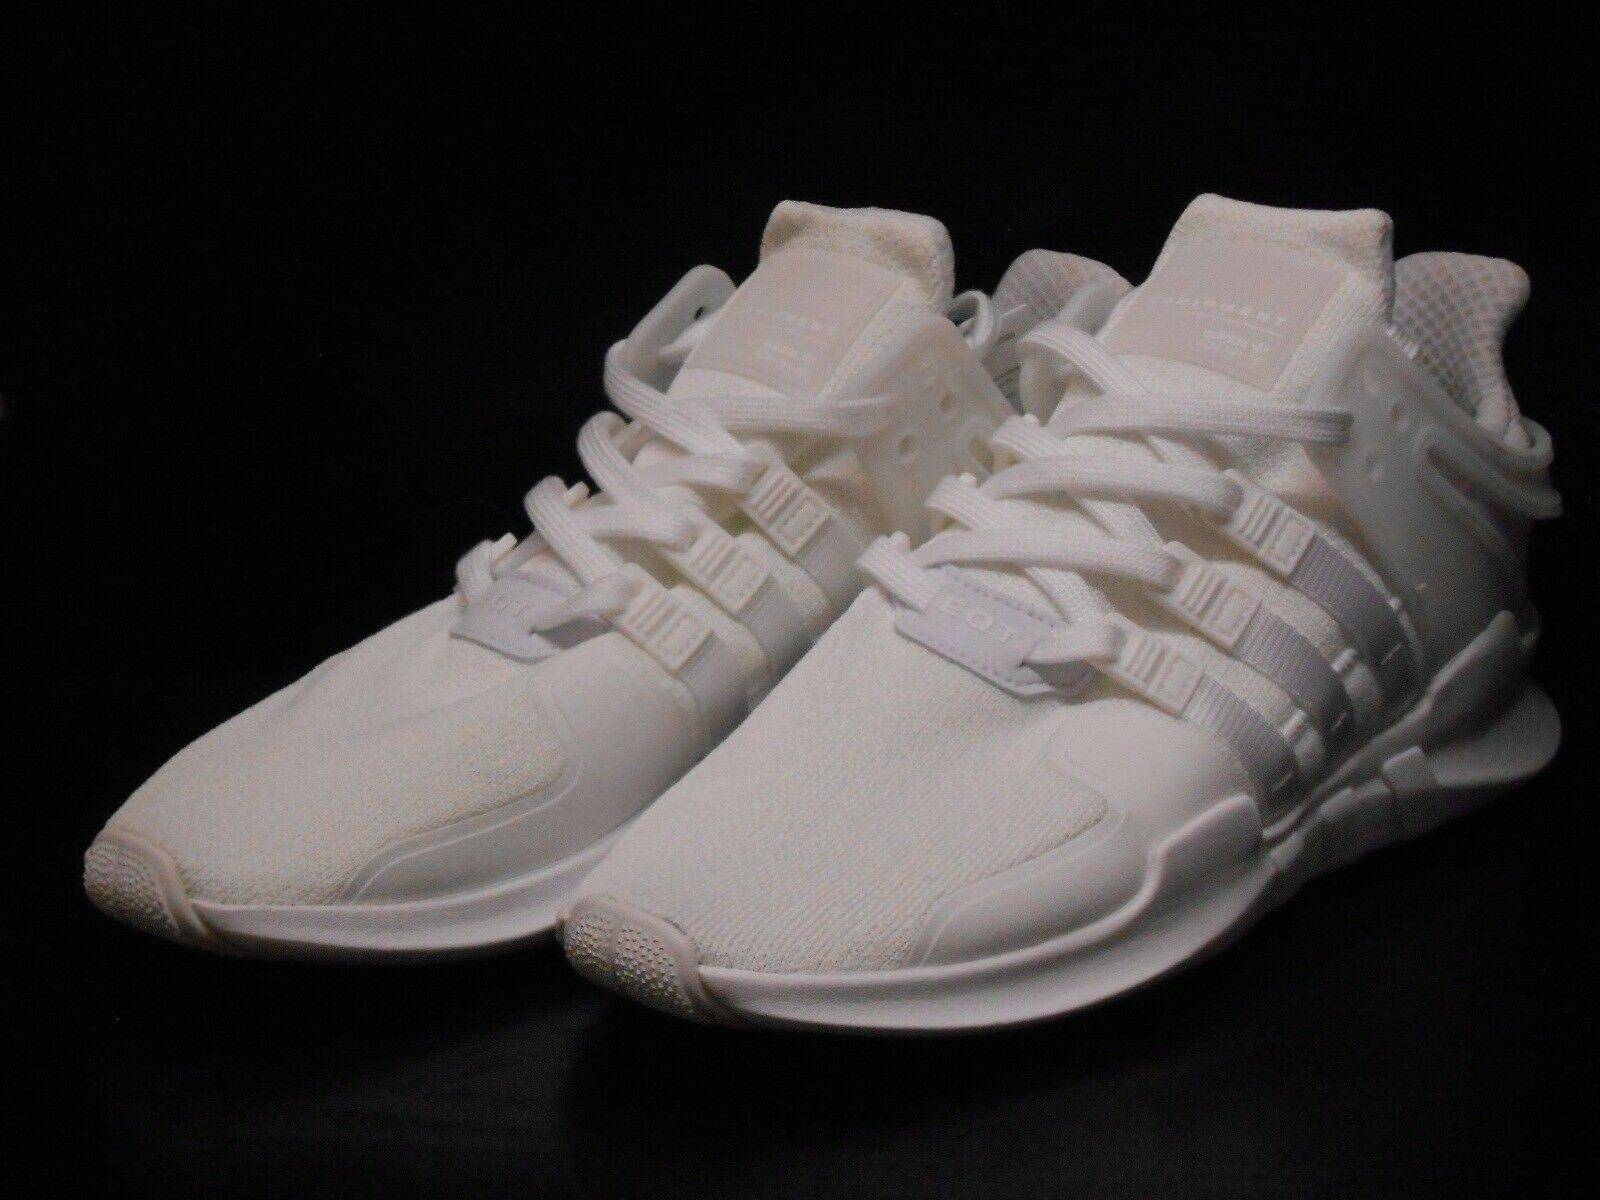 Adidas EQT SUPPORT ADV Mens Running Trainer schuhe schuhe schuhe Größe 7.5   -  dd5a9c